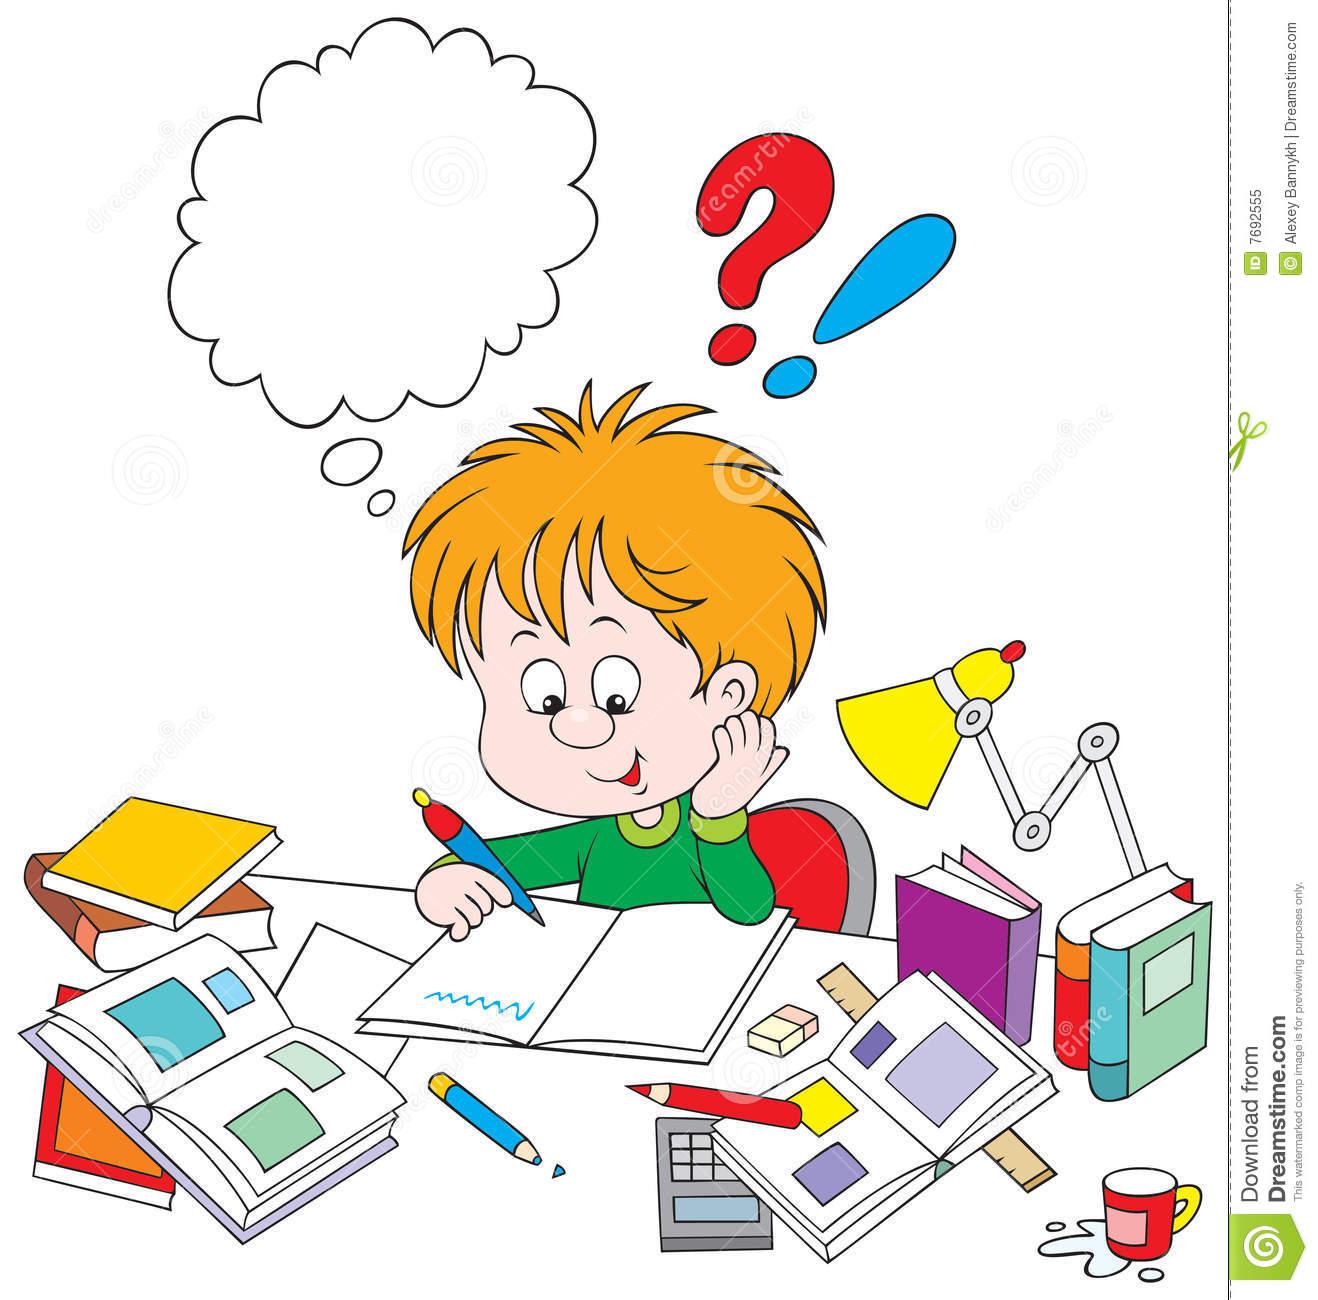 Doing homework clipart tumundografico